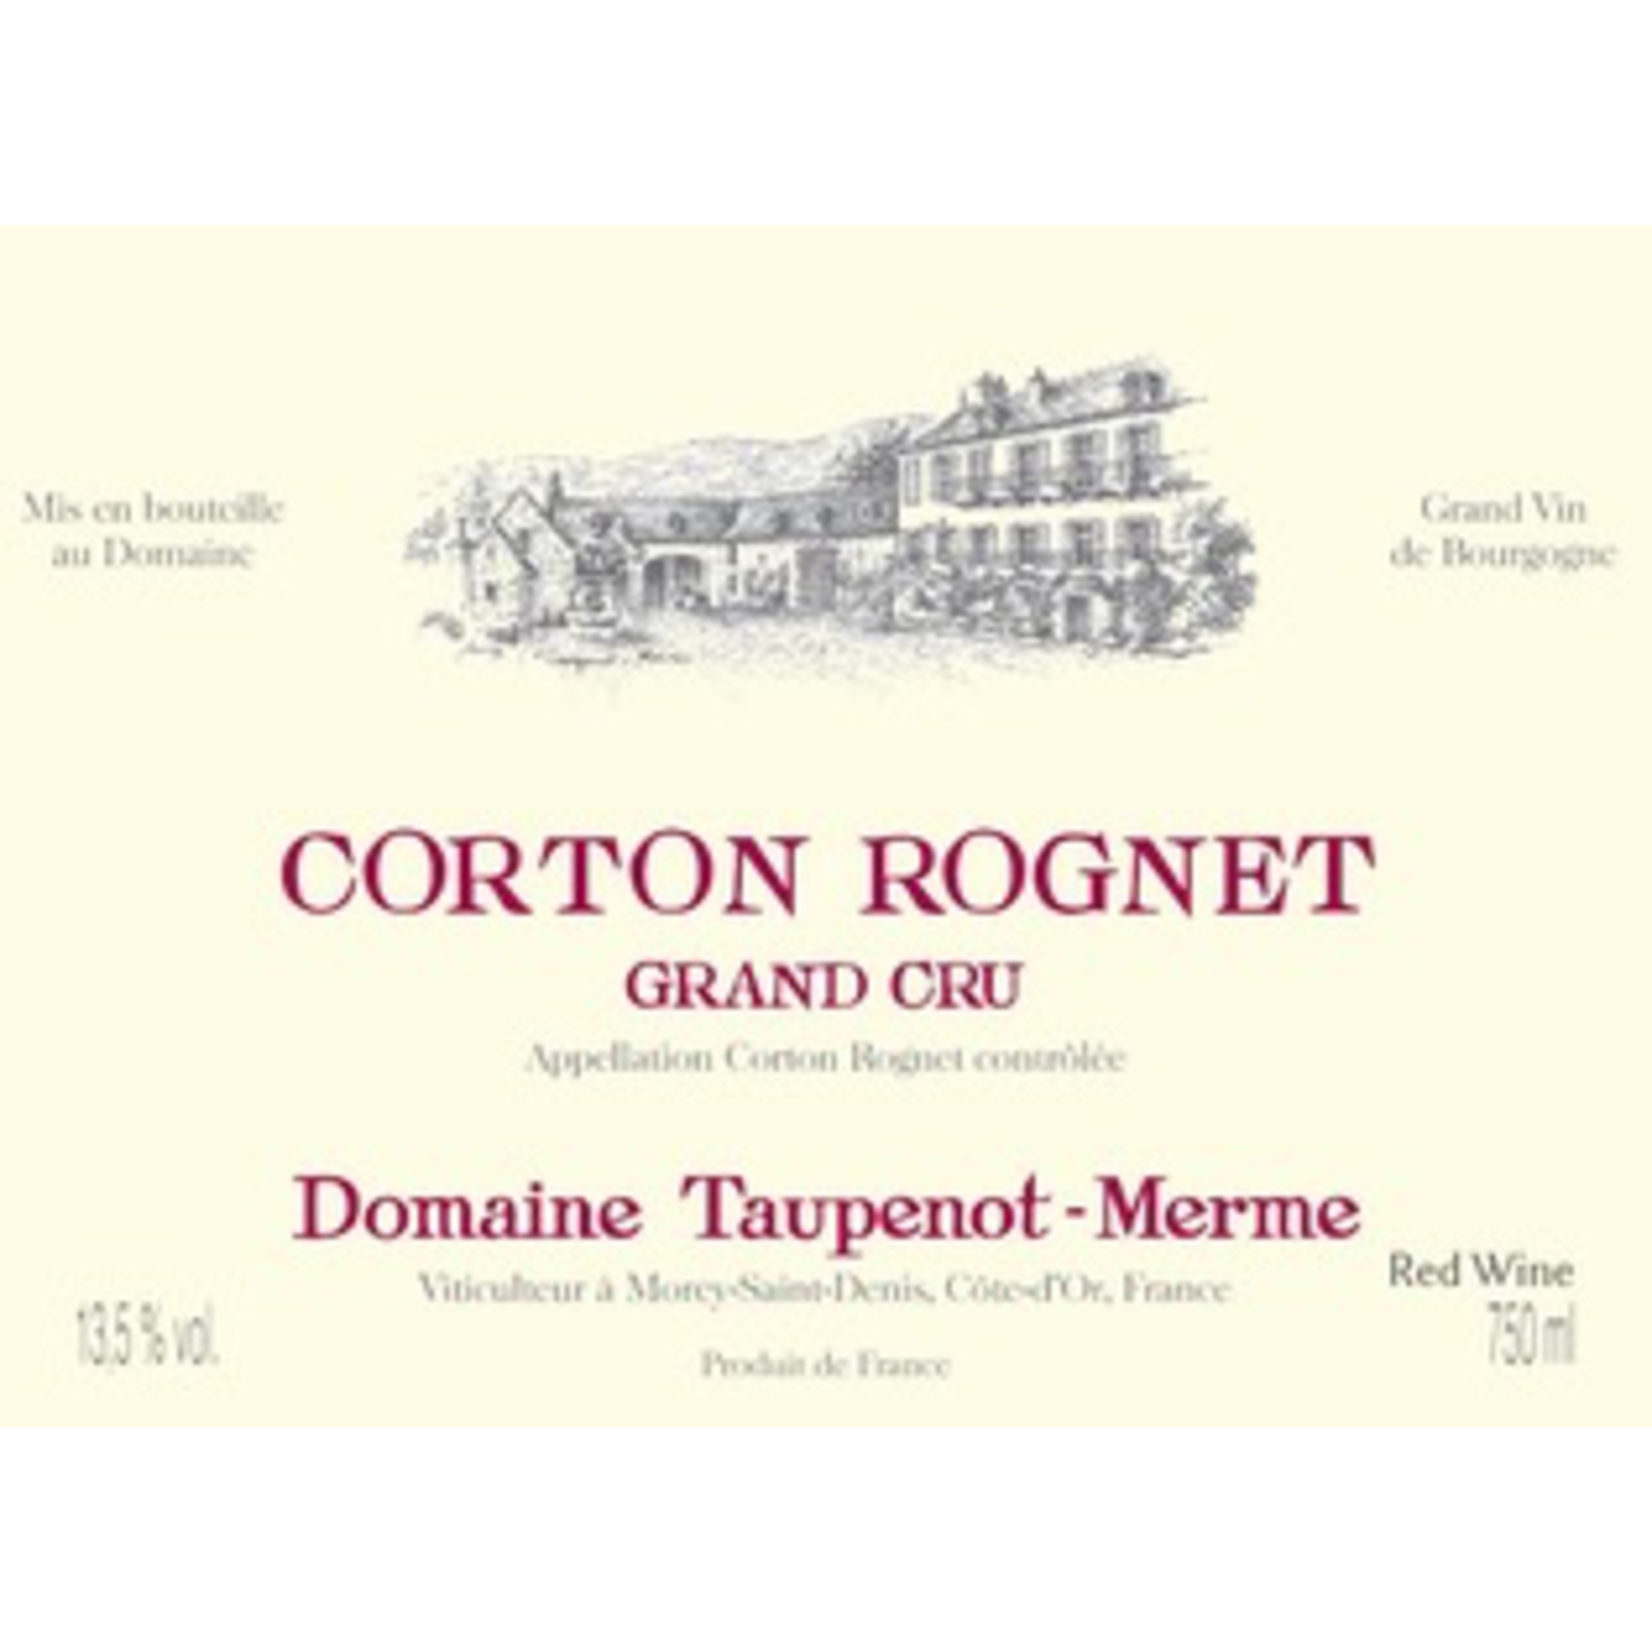 Wine Domaine Taupenot Merme Corton Rognet Grand Cru 2016